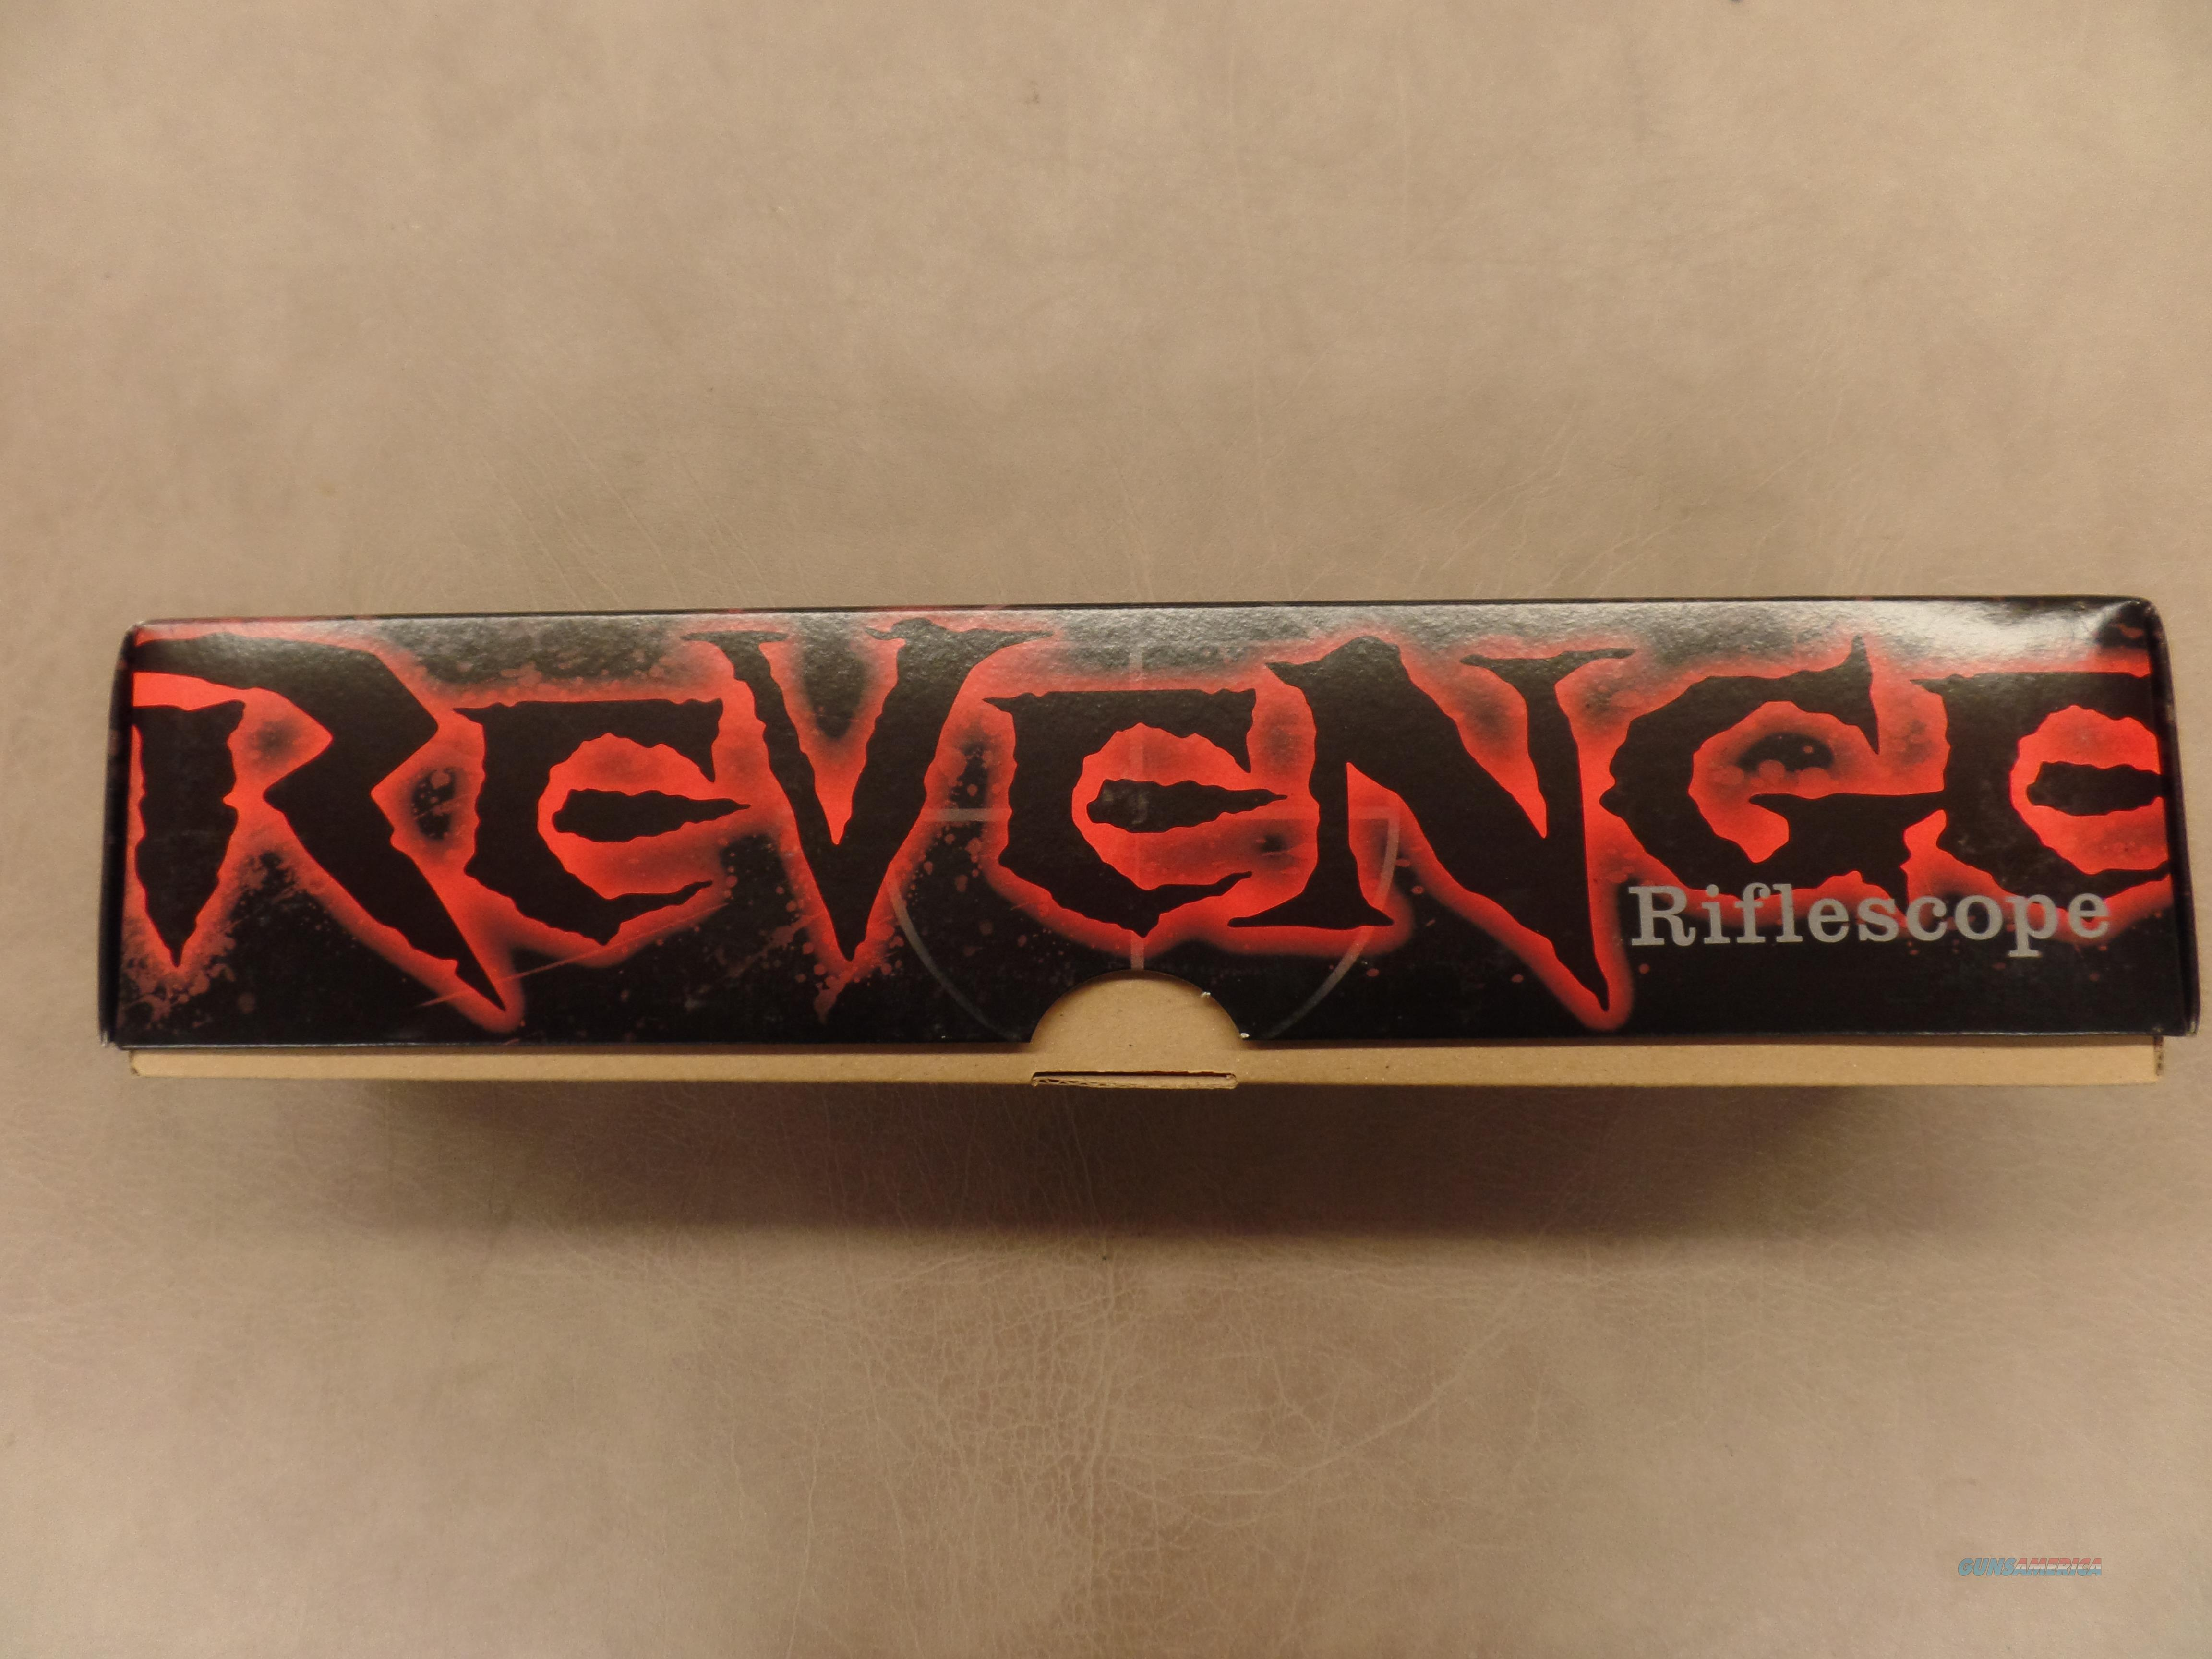 redfield revenge 4 12x42 4 plex for sale. Black Bedroom Furniture Sets. Home Design Ideas